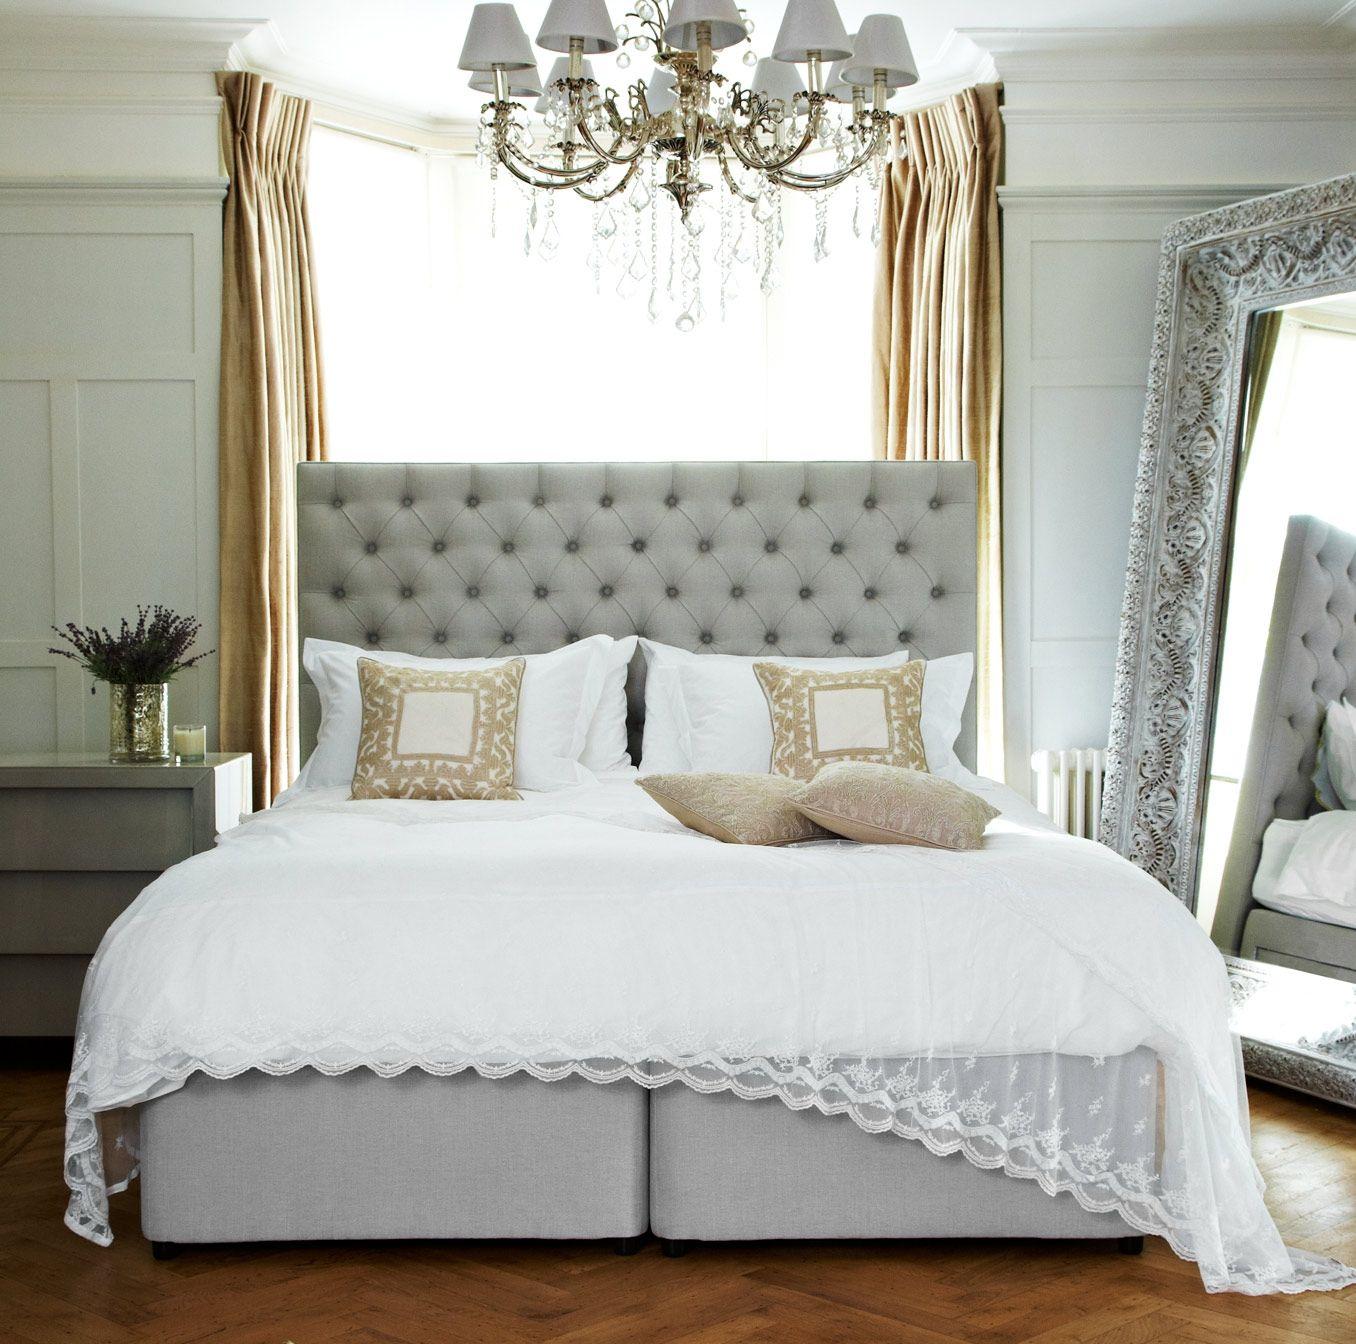 Master bedroom bed  Lockley Bed  Beautiful Spaces  Pinterest  Bedrooms Beautiful